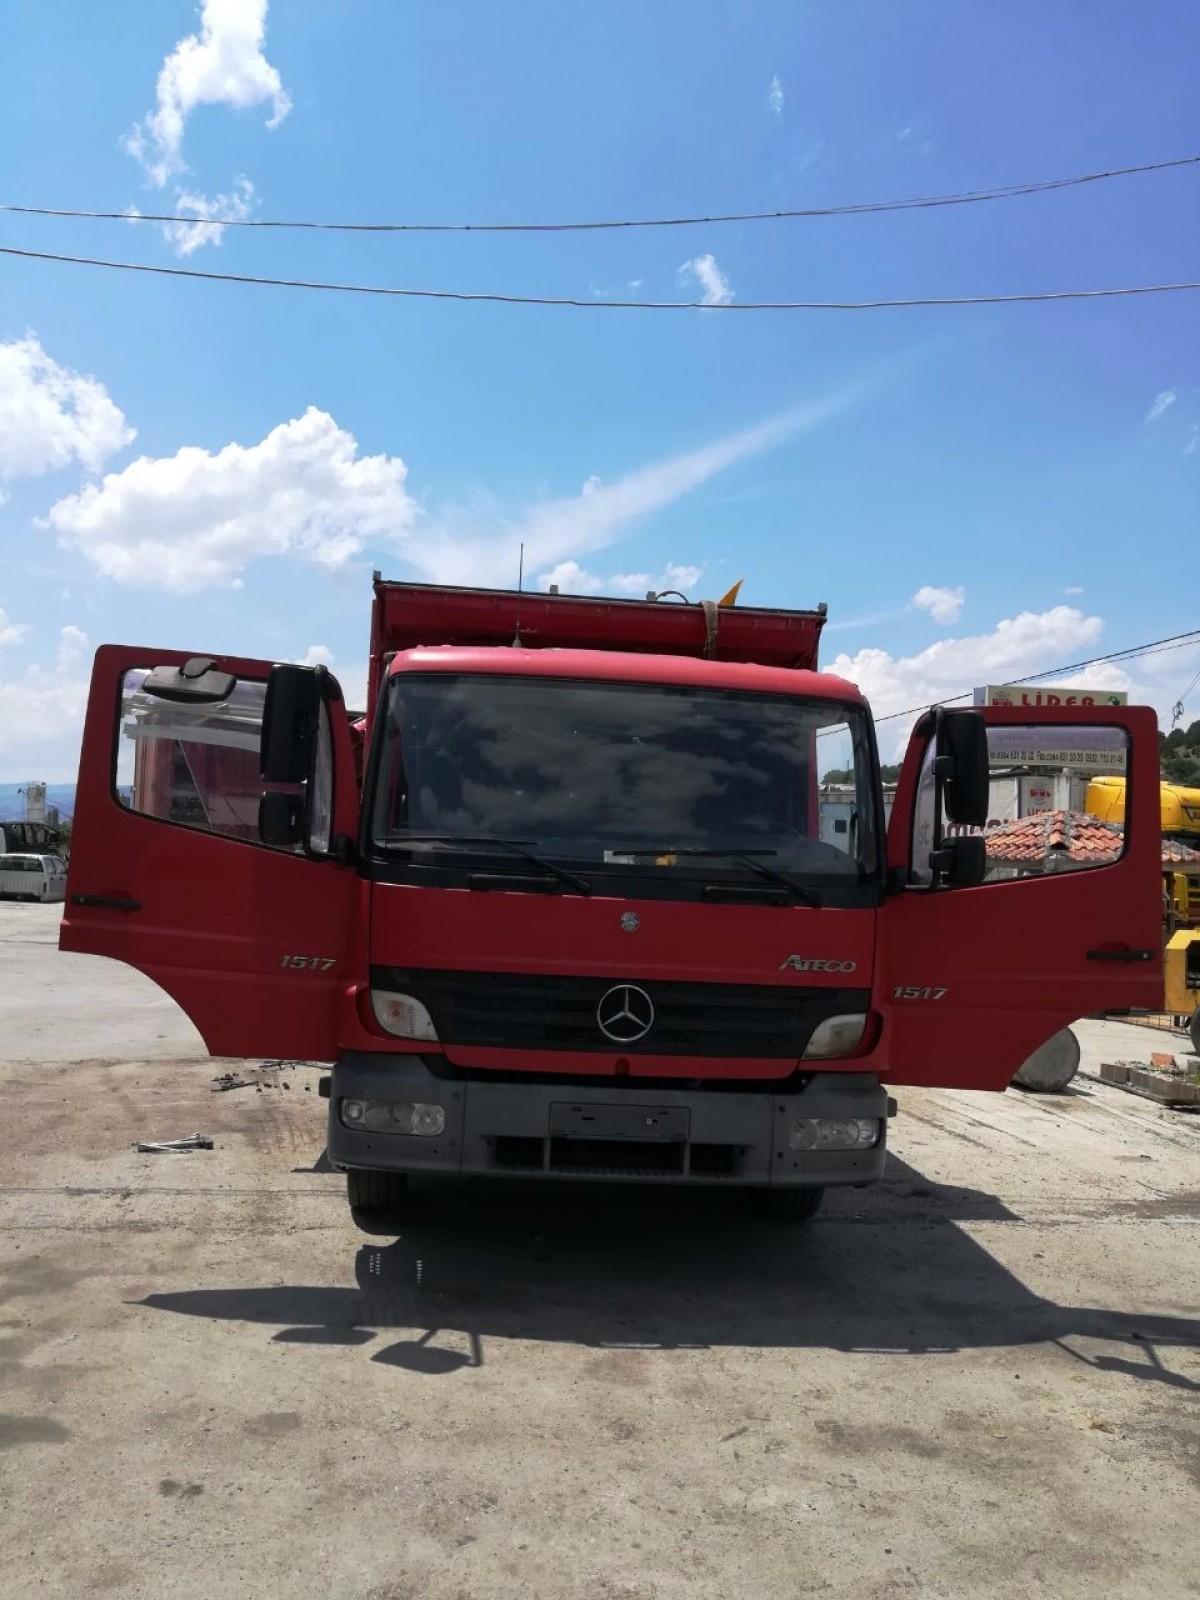 2 el kamyon kupalari 05456617110 kamyon kamyonet corum cikma